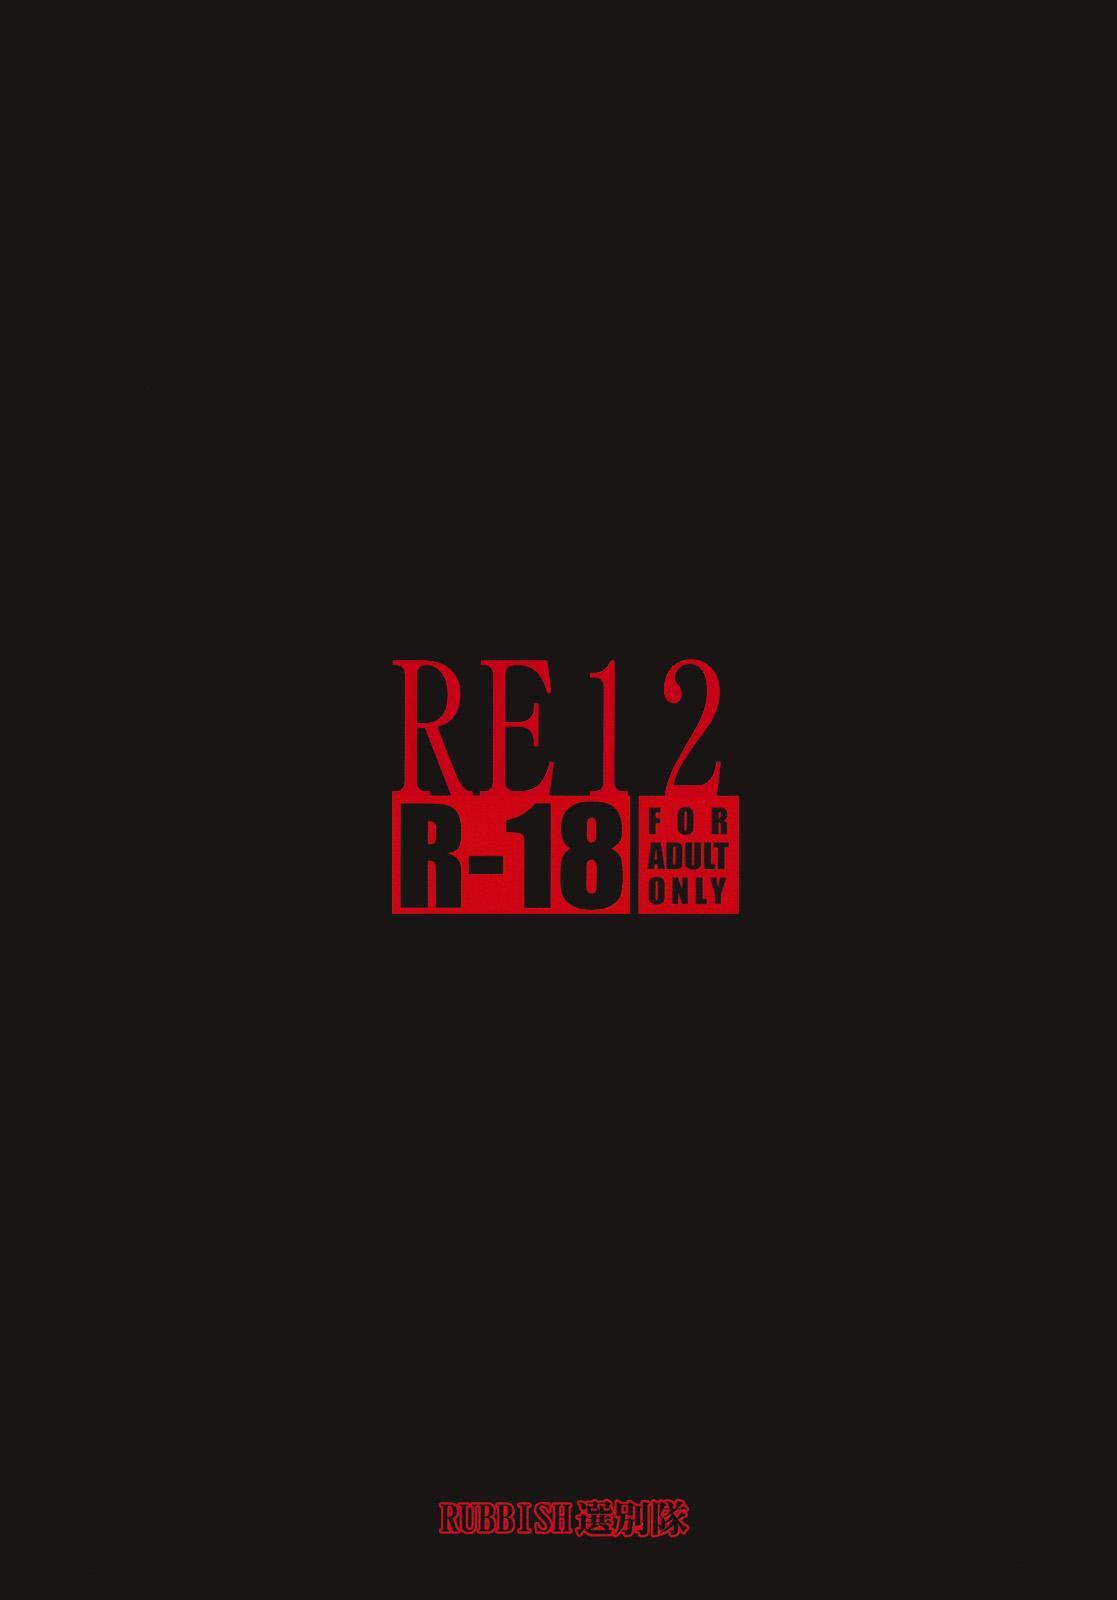 RE12 32